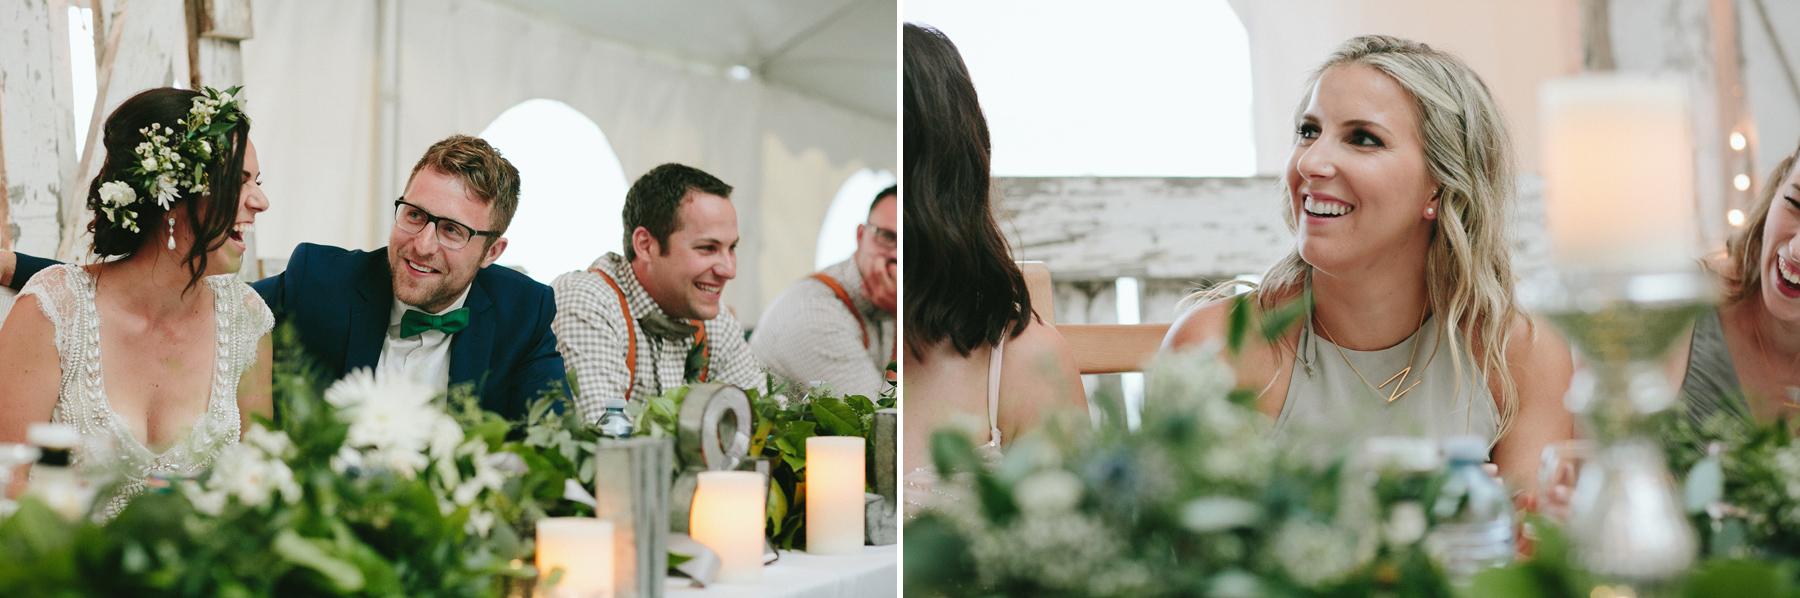 alberta-farm-wedding-photographer-rp-wj-217.jpg